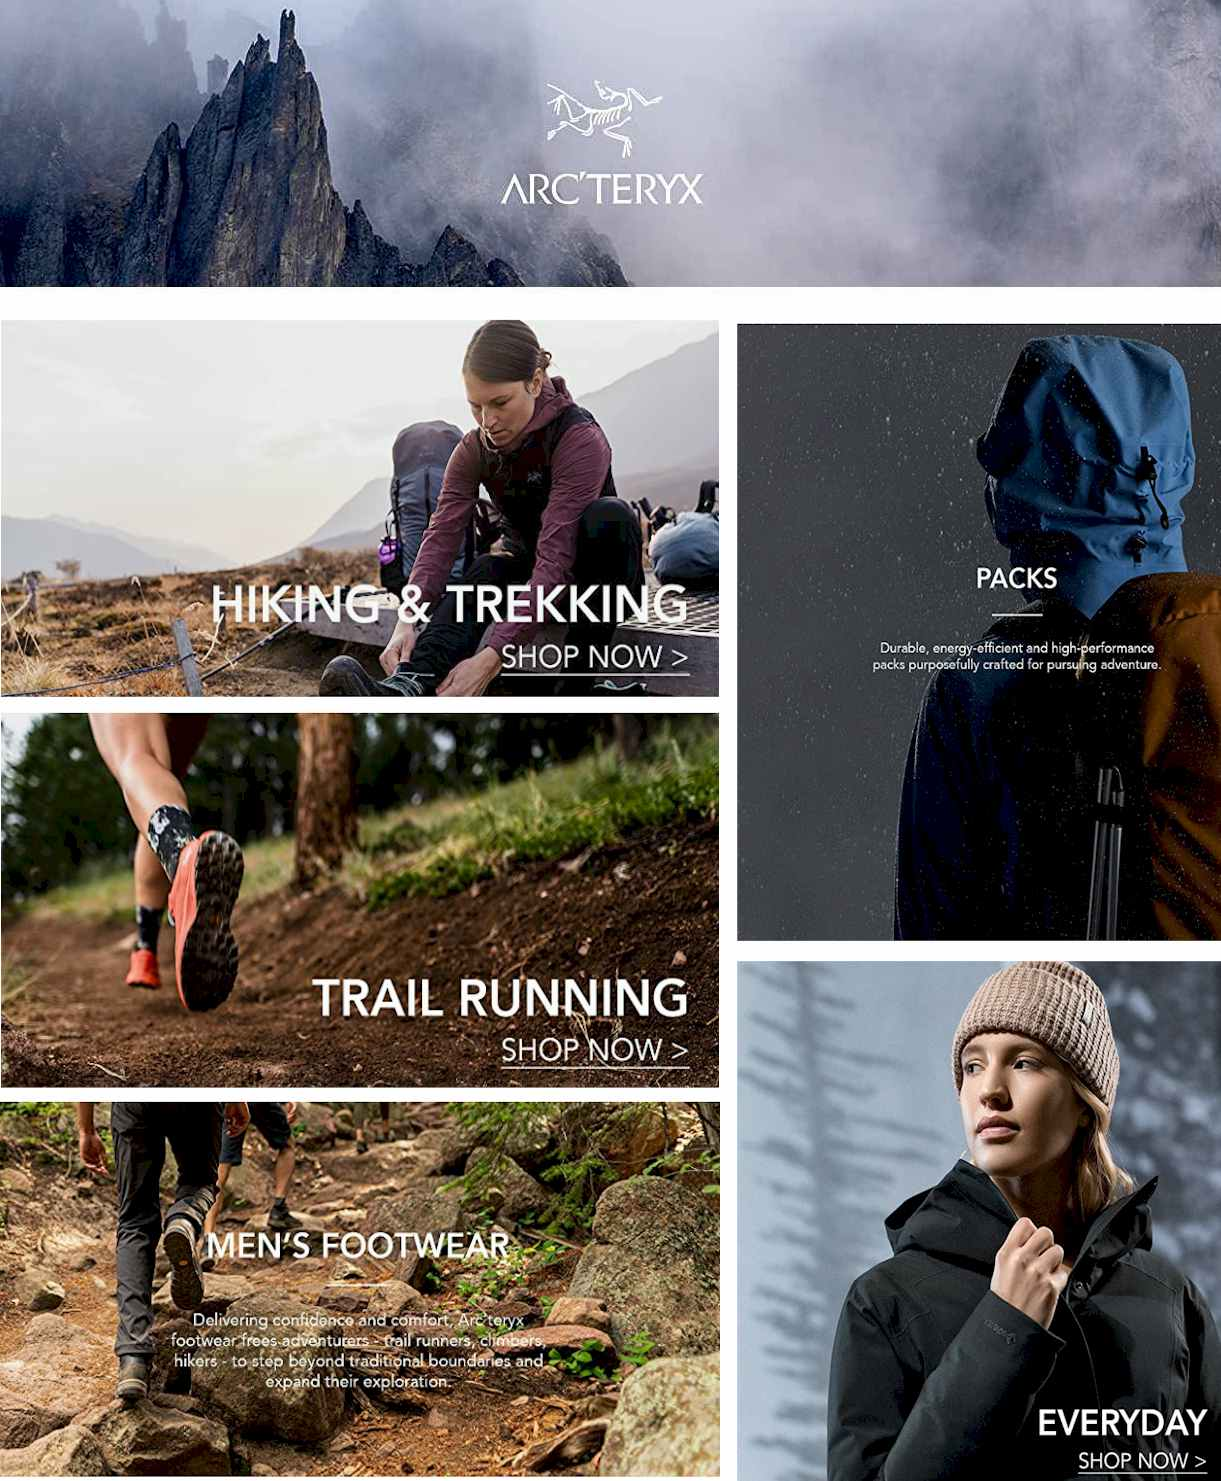 #Arc'teryx sport wear - #hiking #Trekking #casual #Outdoor #camping #Woman